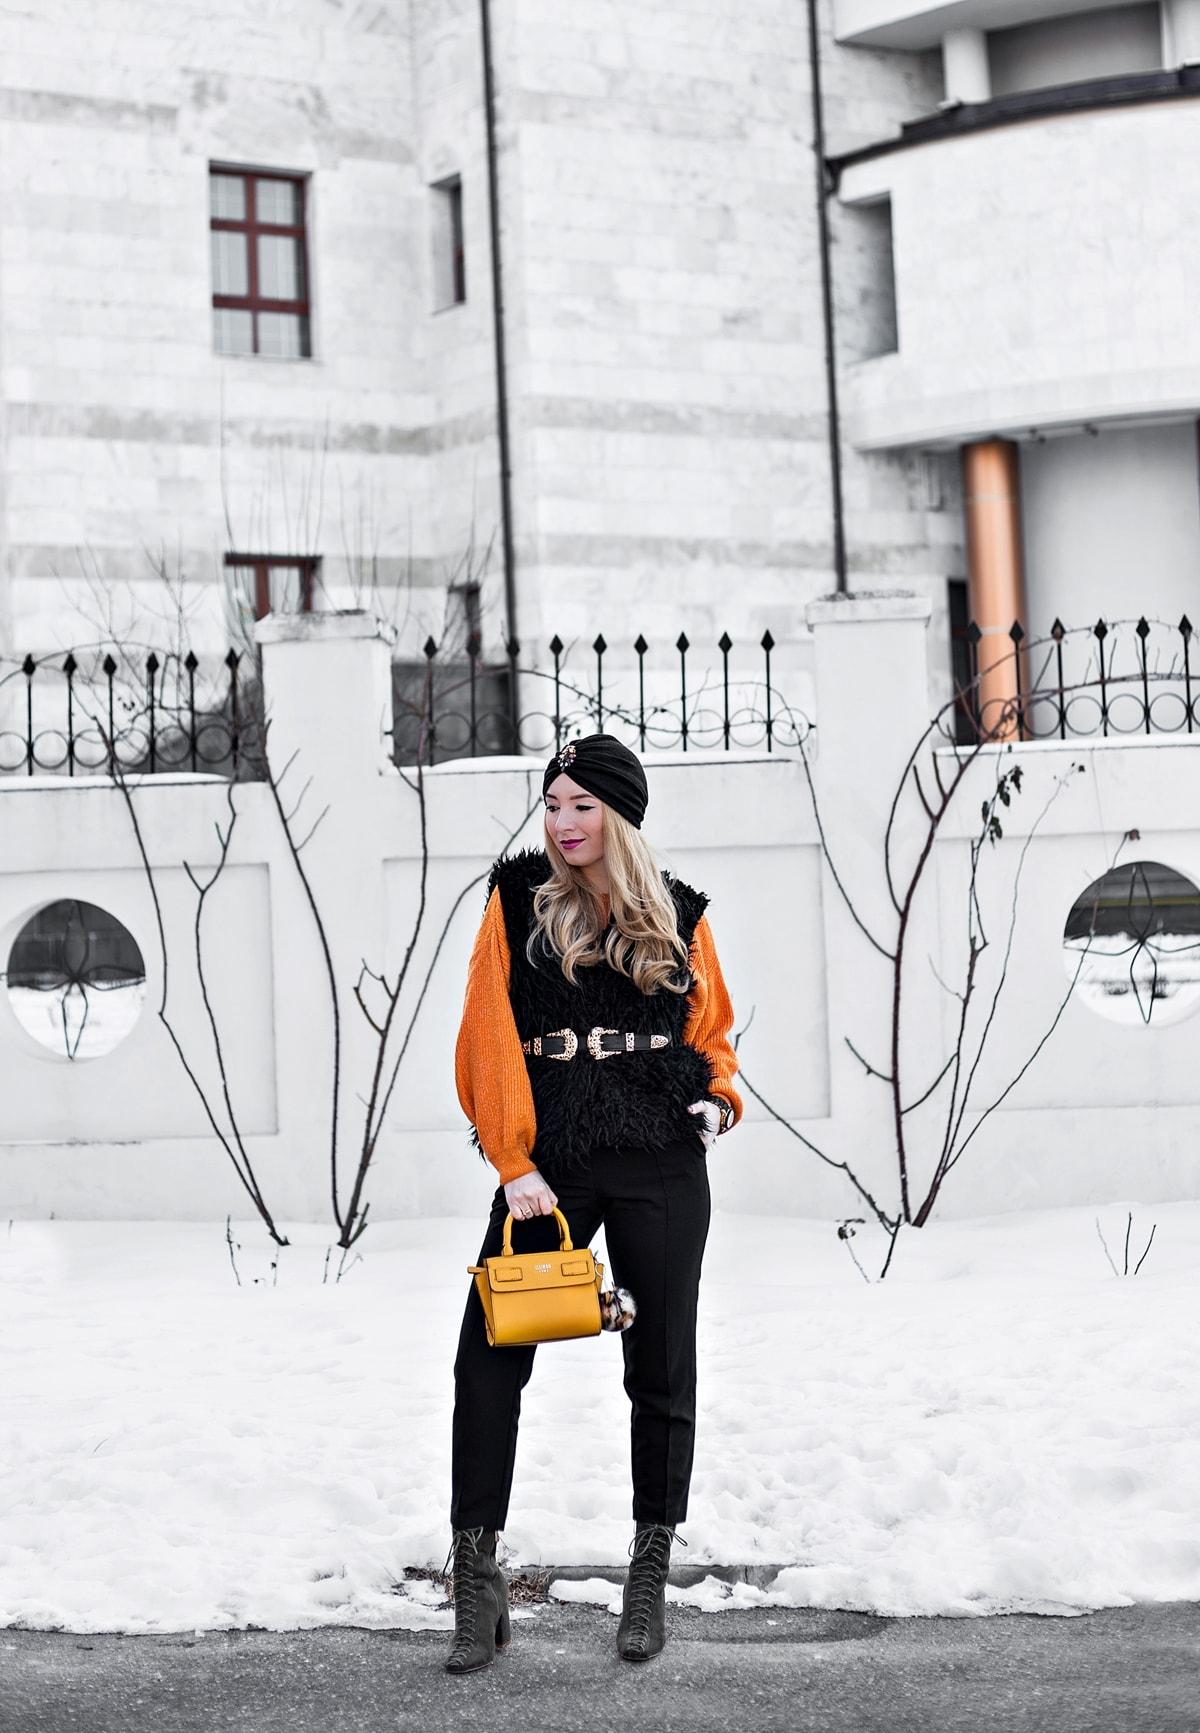 Tinuta de iarna, blogger moda, Andreea Ristea, pulover orange, portocaliu cu fir lurex, vesta blana neagra, pantaloni office negri, botine cu siret verde military, kaki, curea cu capete aurii, turban lune negru accesorizat, geanta guess, galben mustar